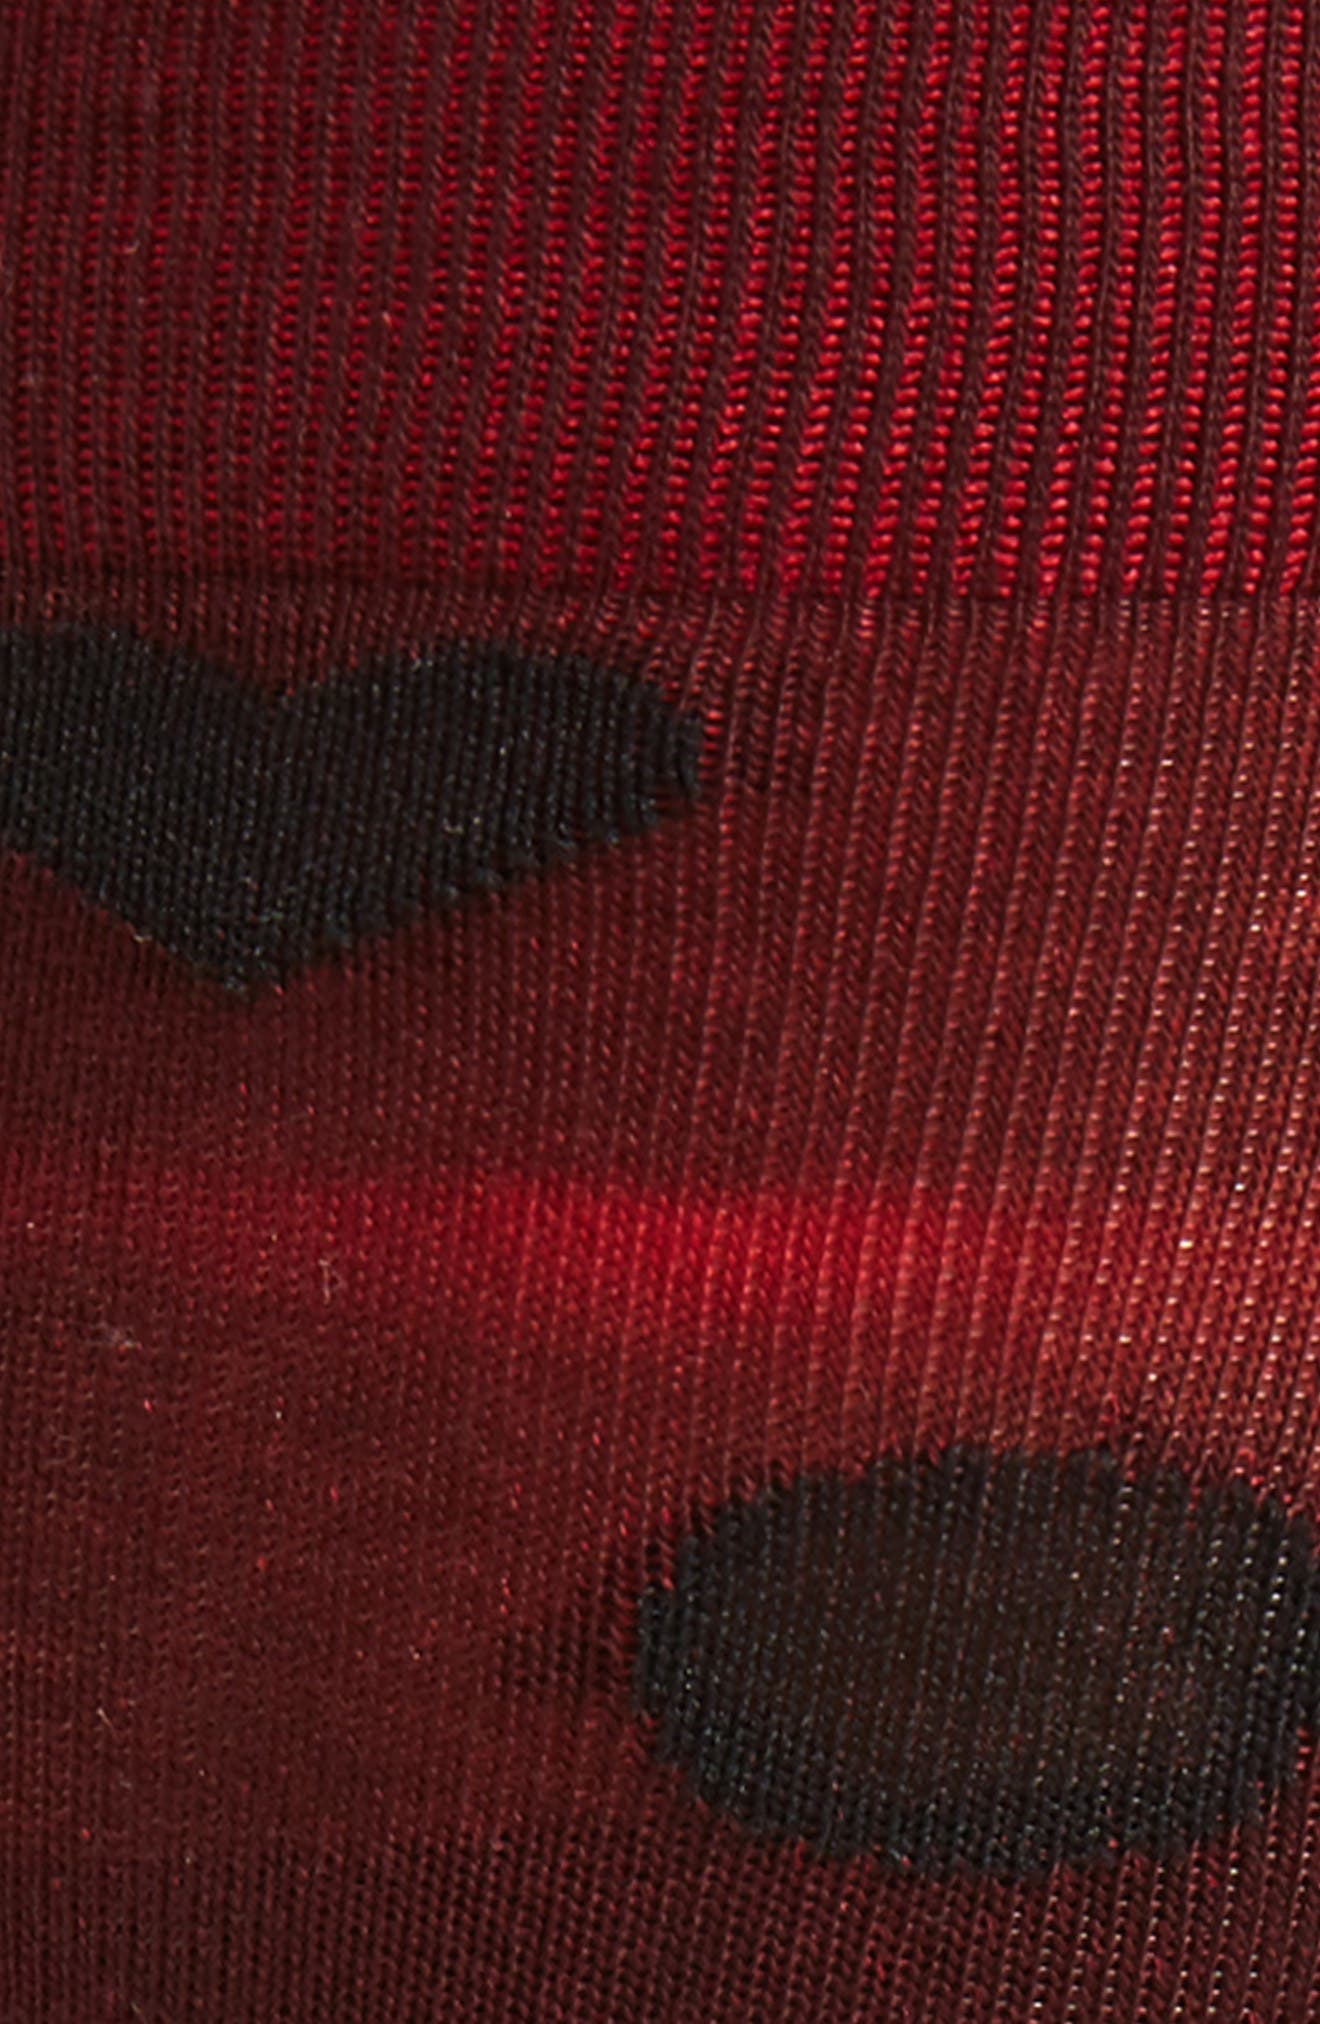 Flamenco Crew Socks,                             Alternate thumbnail 2, color,                             610